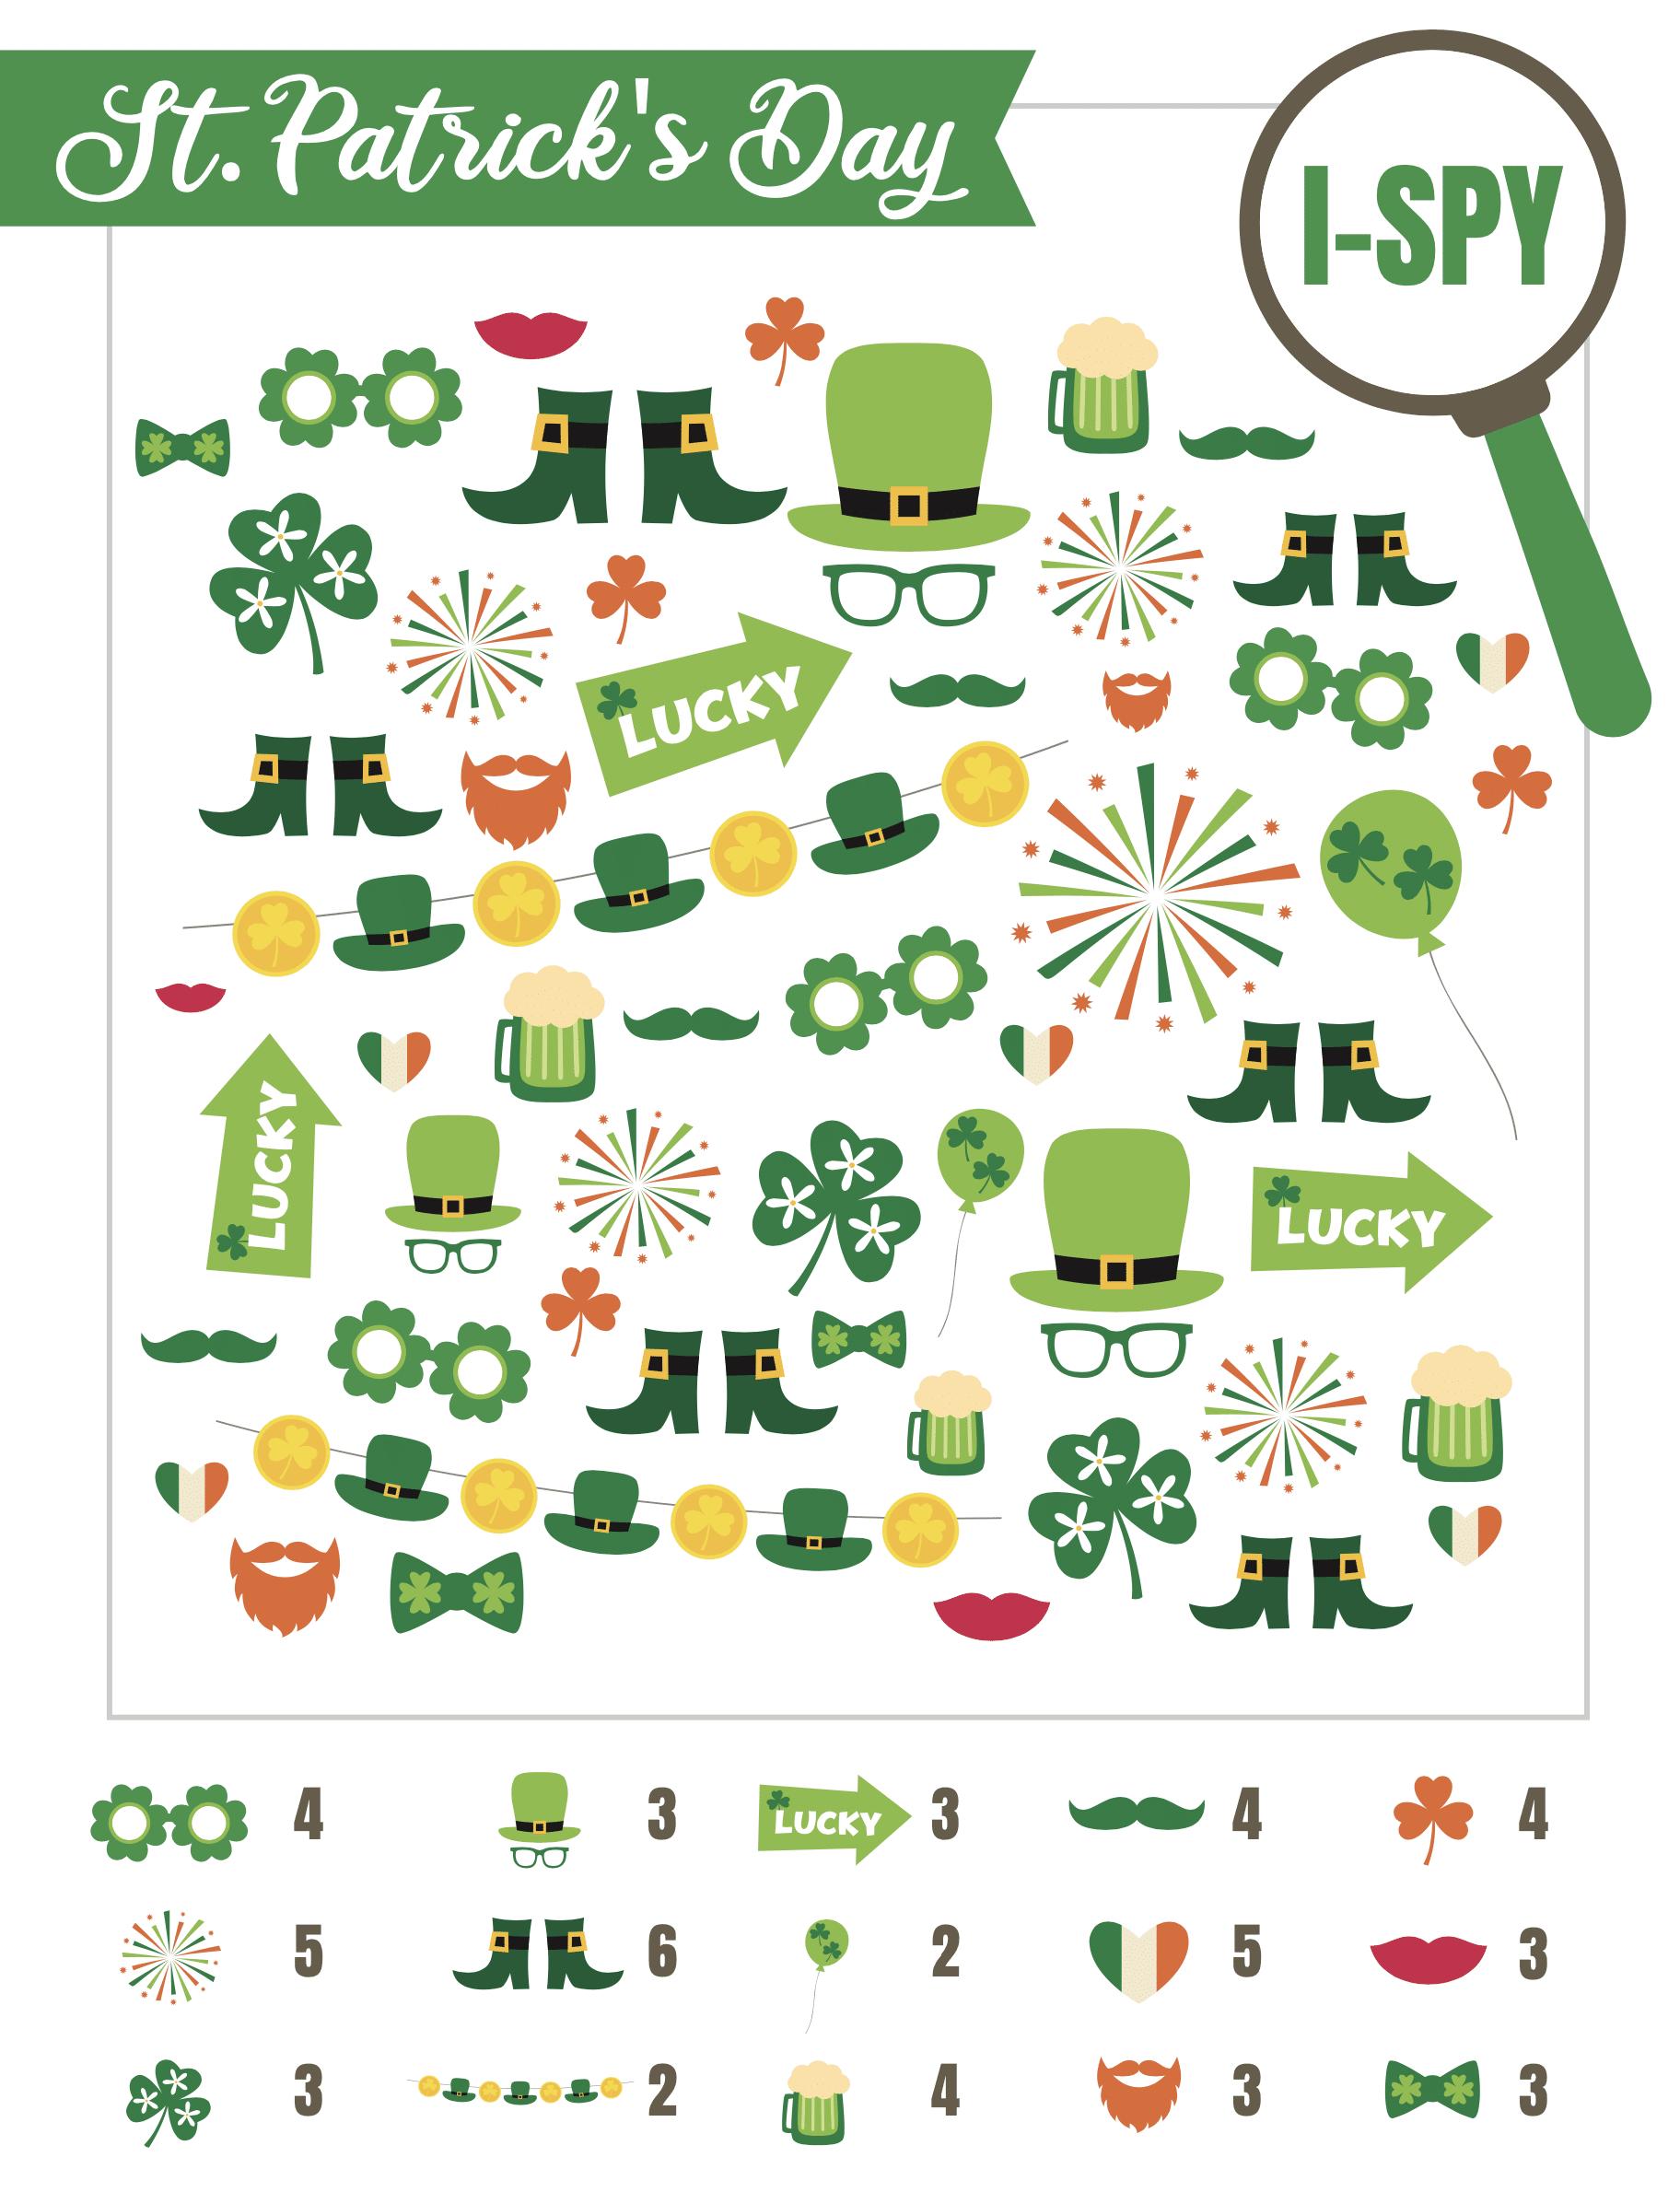 St. Patrick's Day i-spy sheet